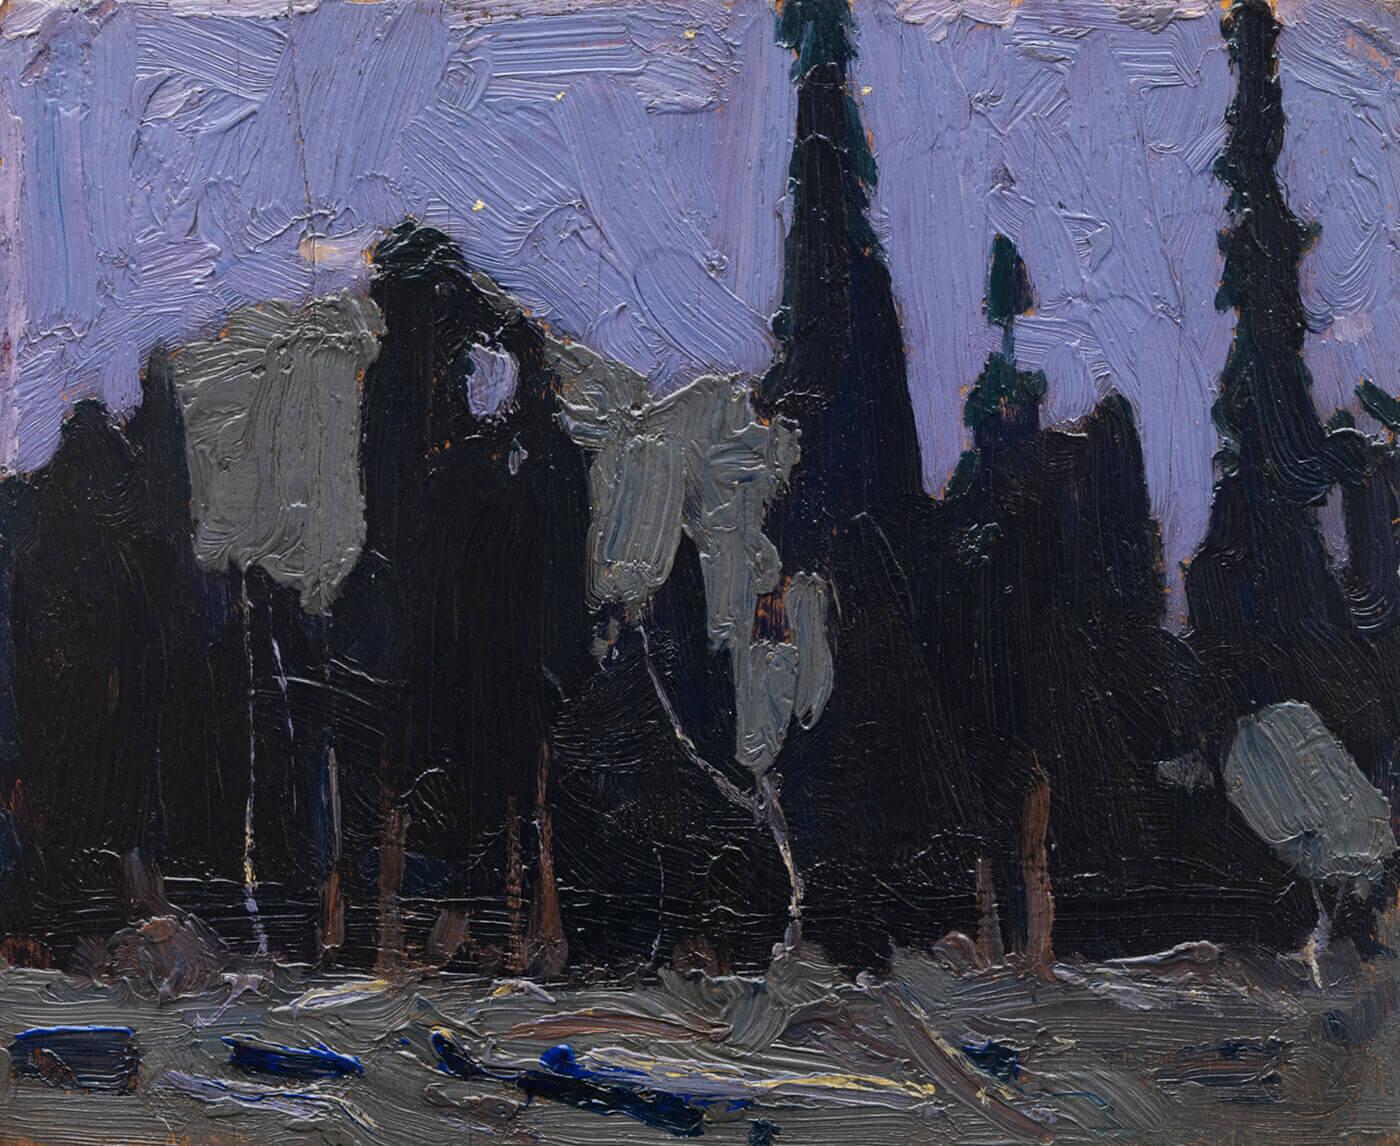 Tom Thomson, Nocturne: Forest Spires, 1916